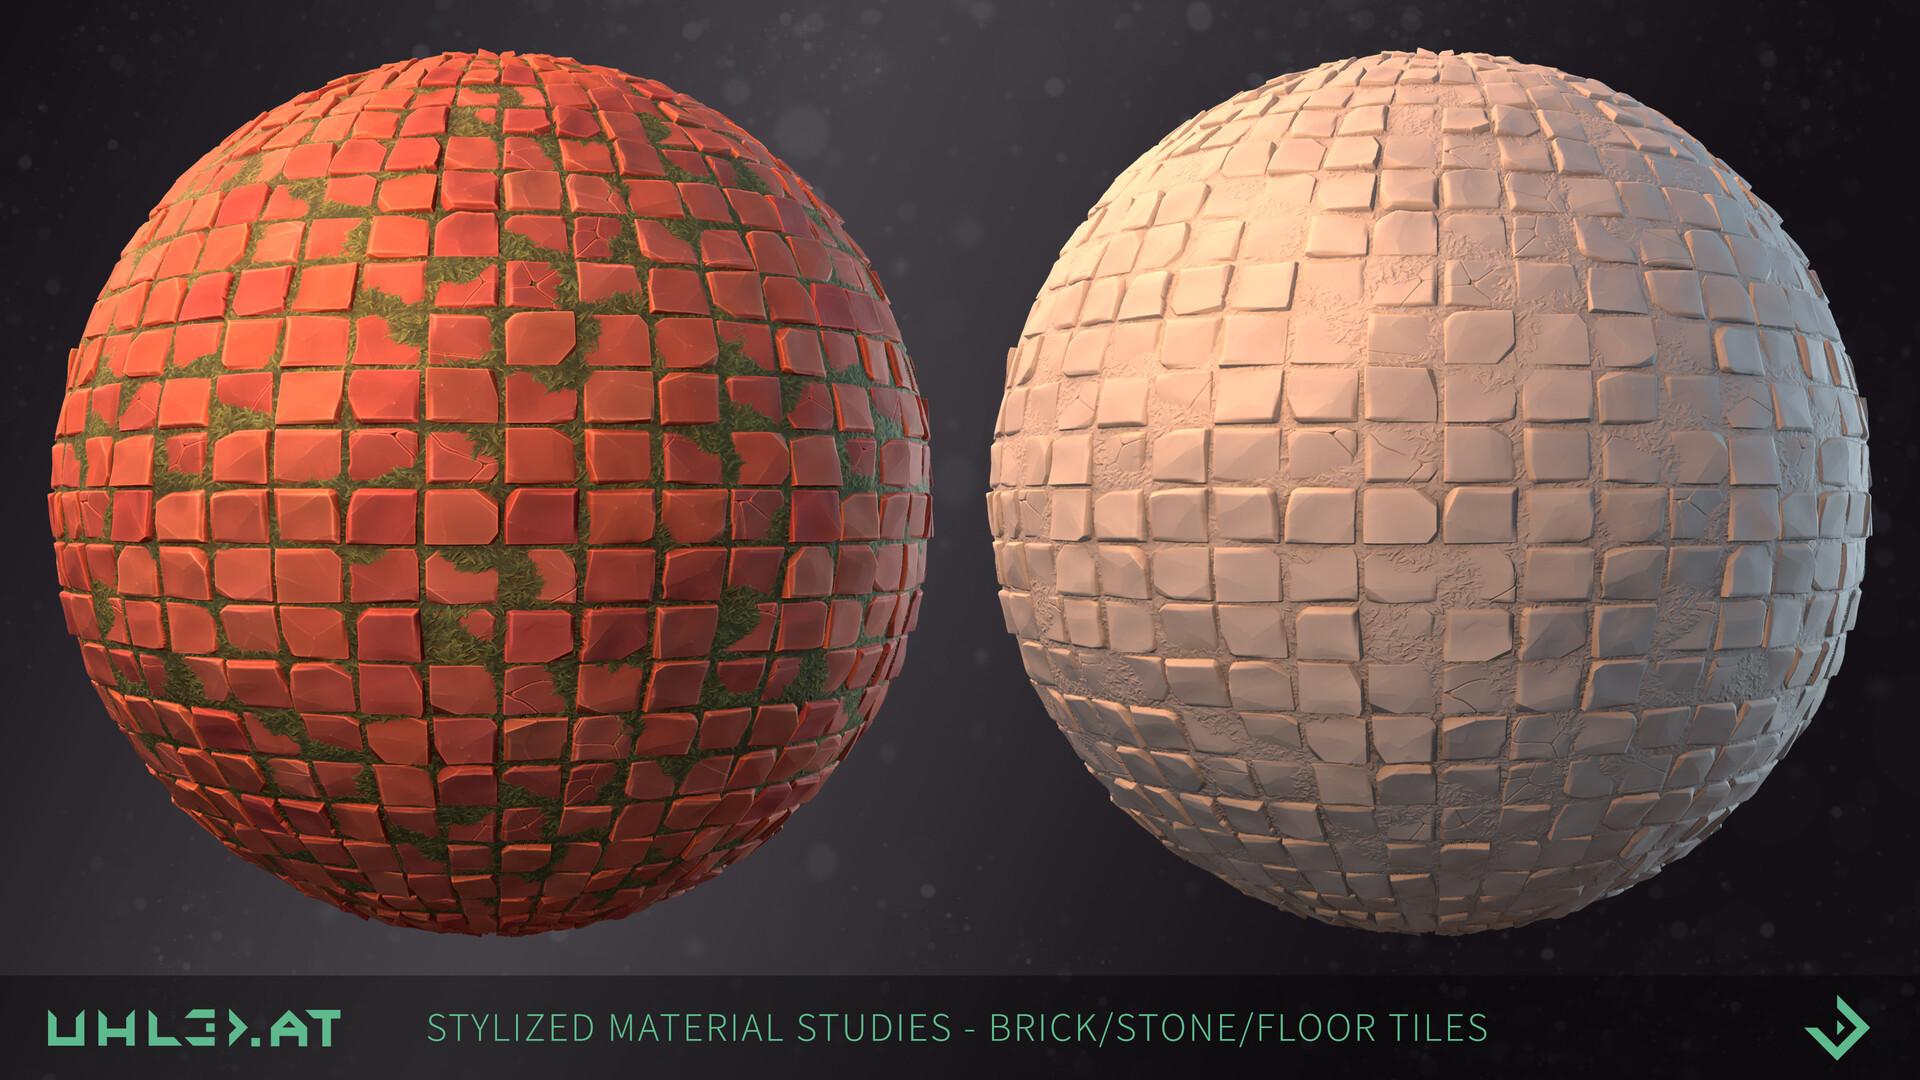 Dominik uhl stylized brick stone studies 03